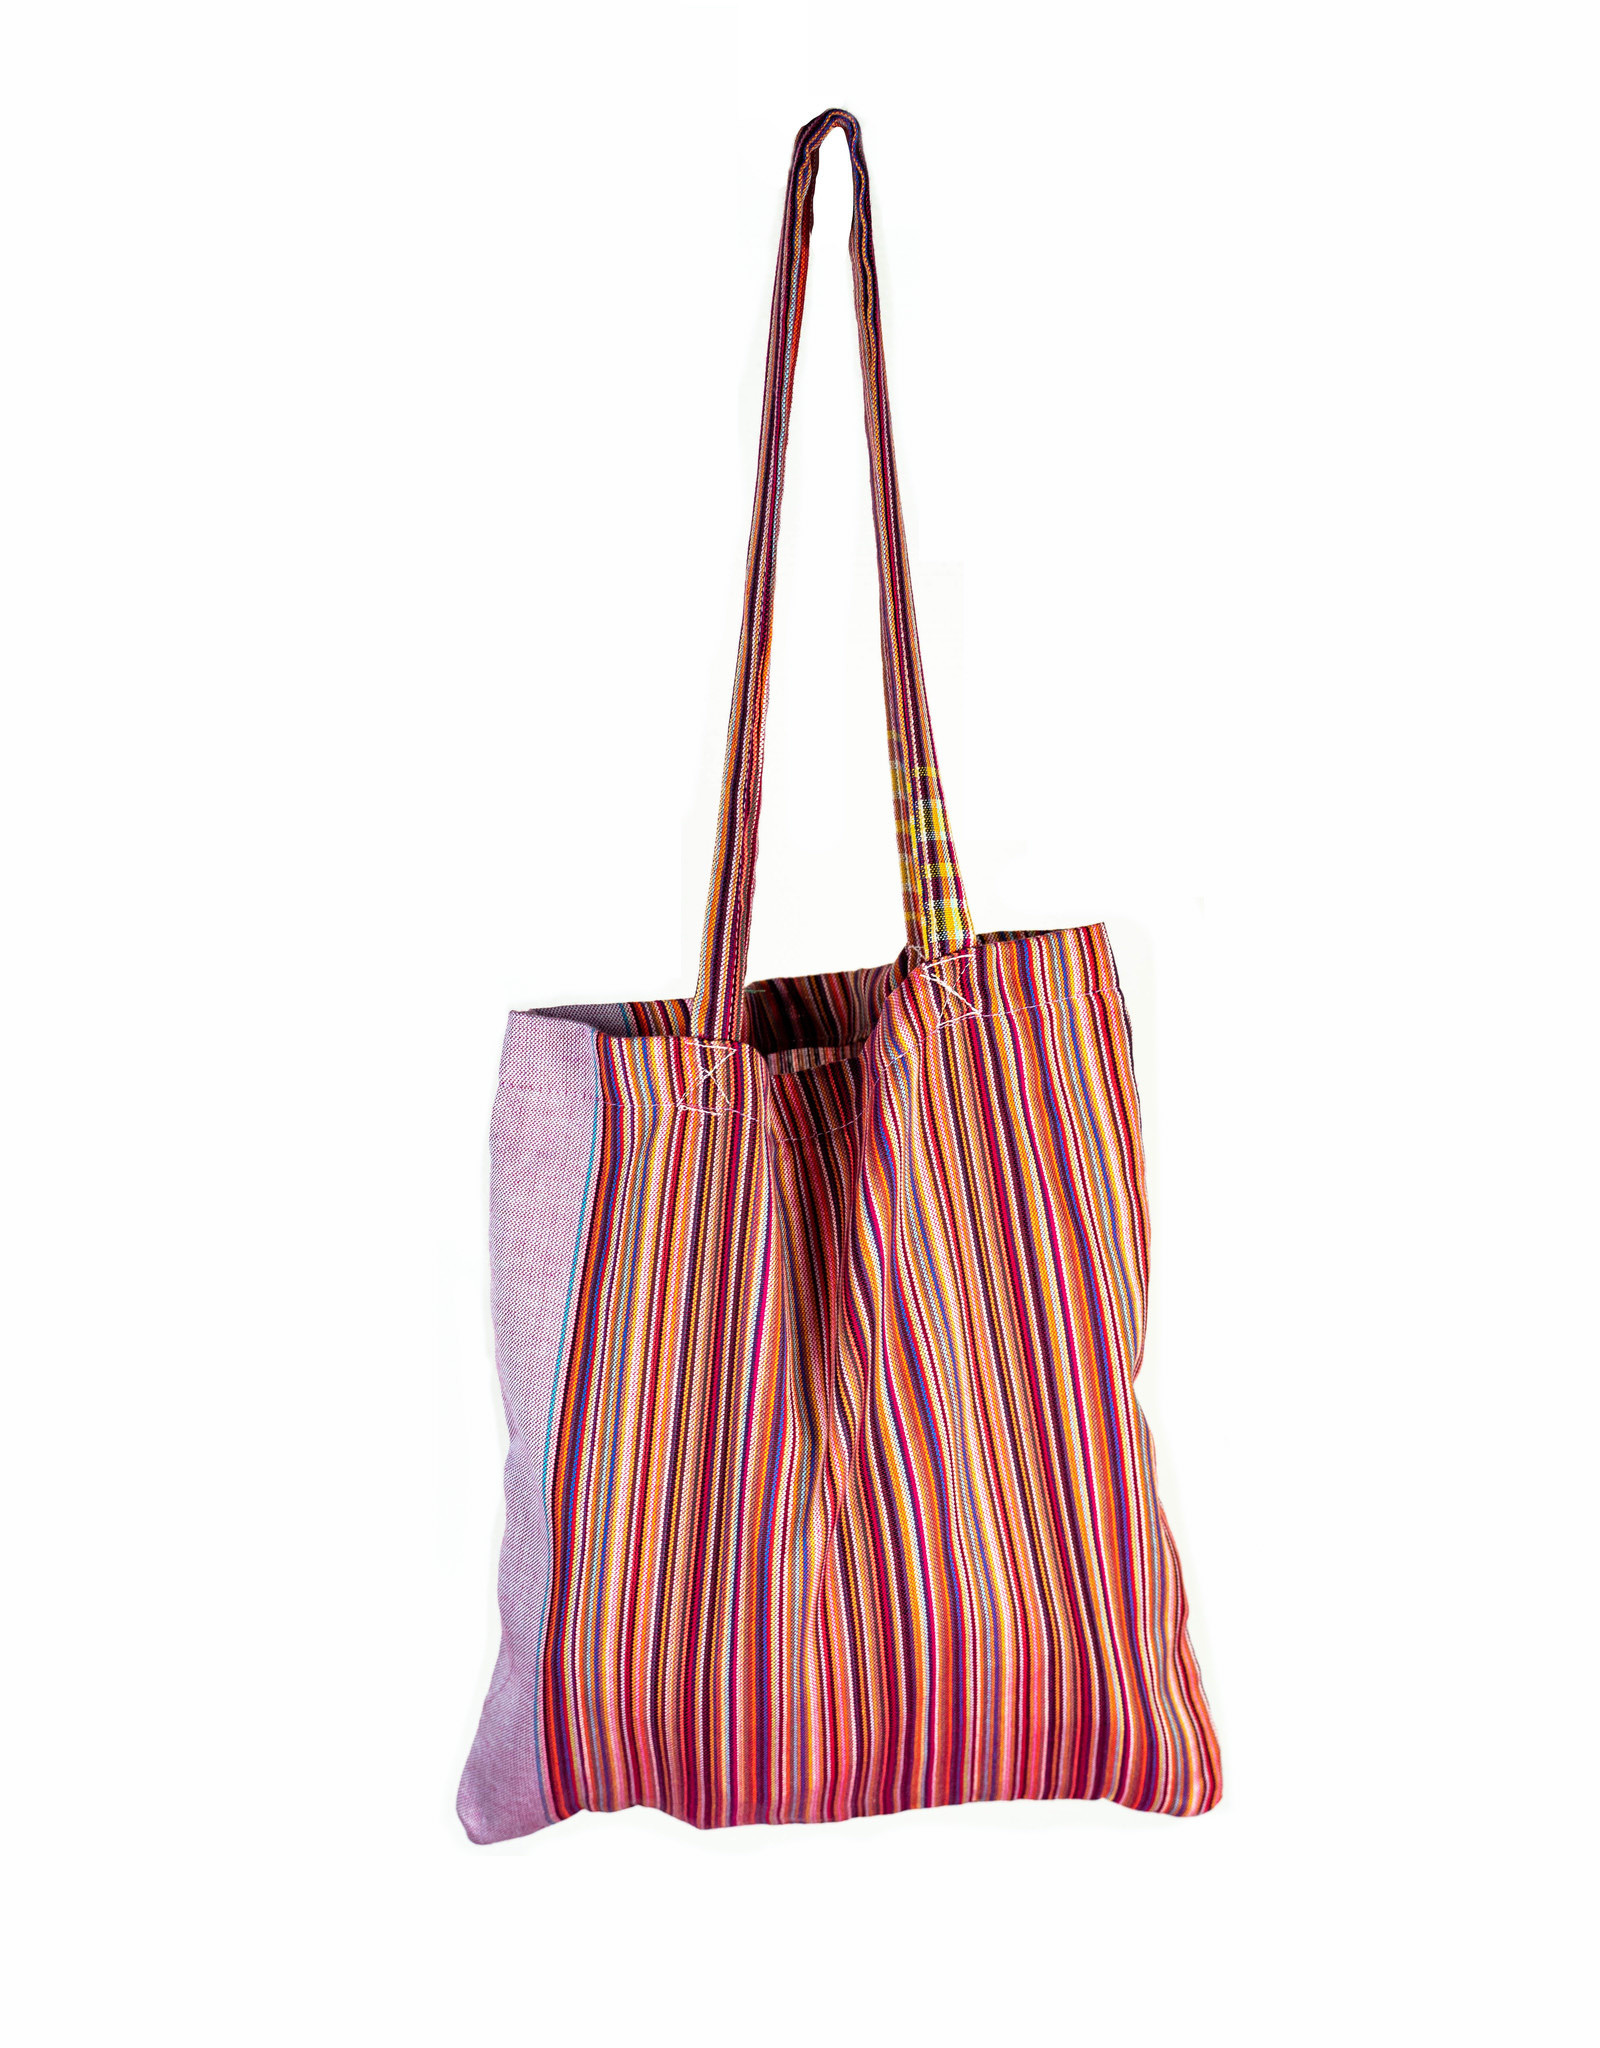 Maisha.Style Kikoy Tote bag - stripey mixed red